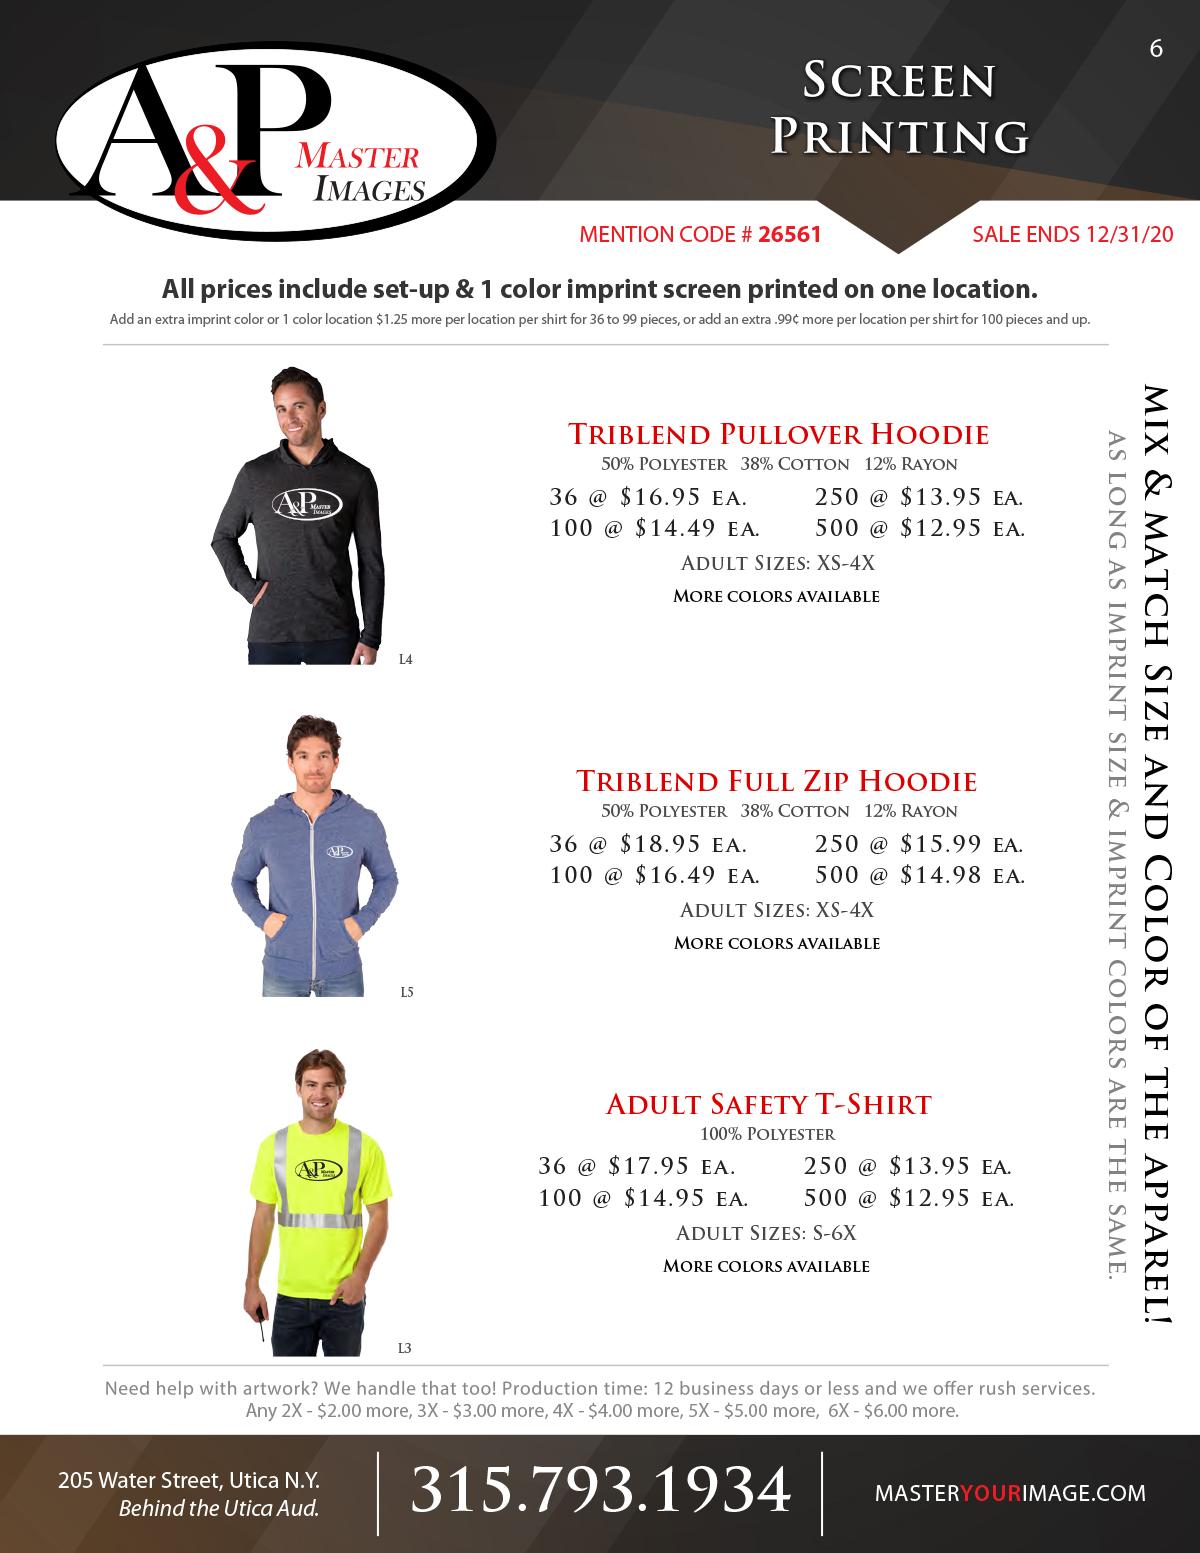 Sales Flyers - Screen Printing 06